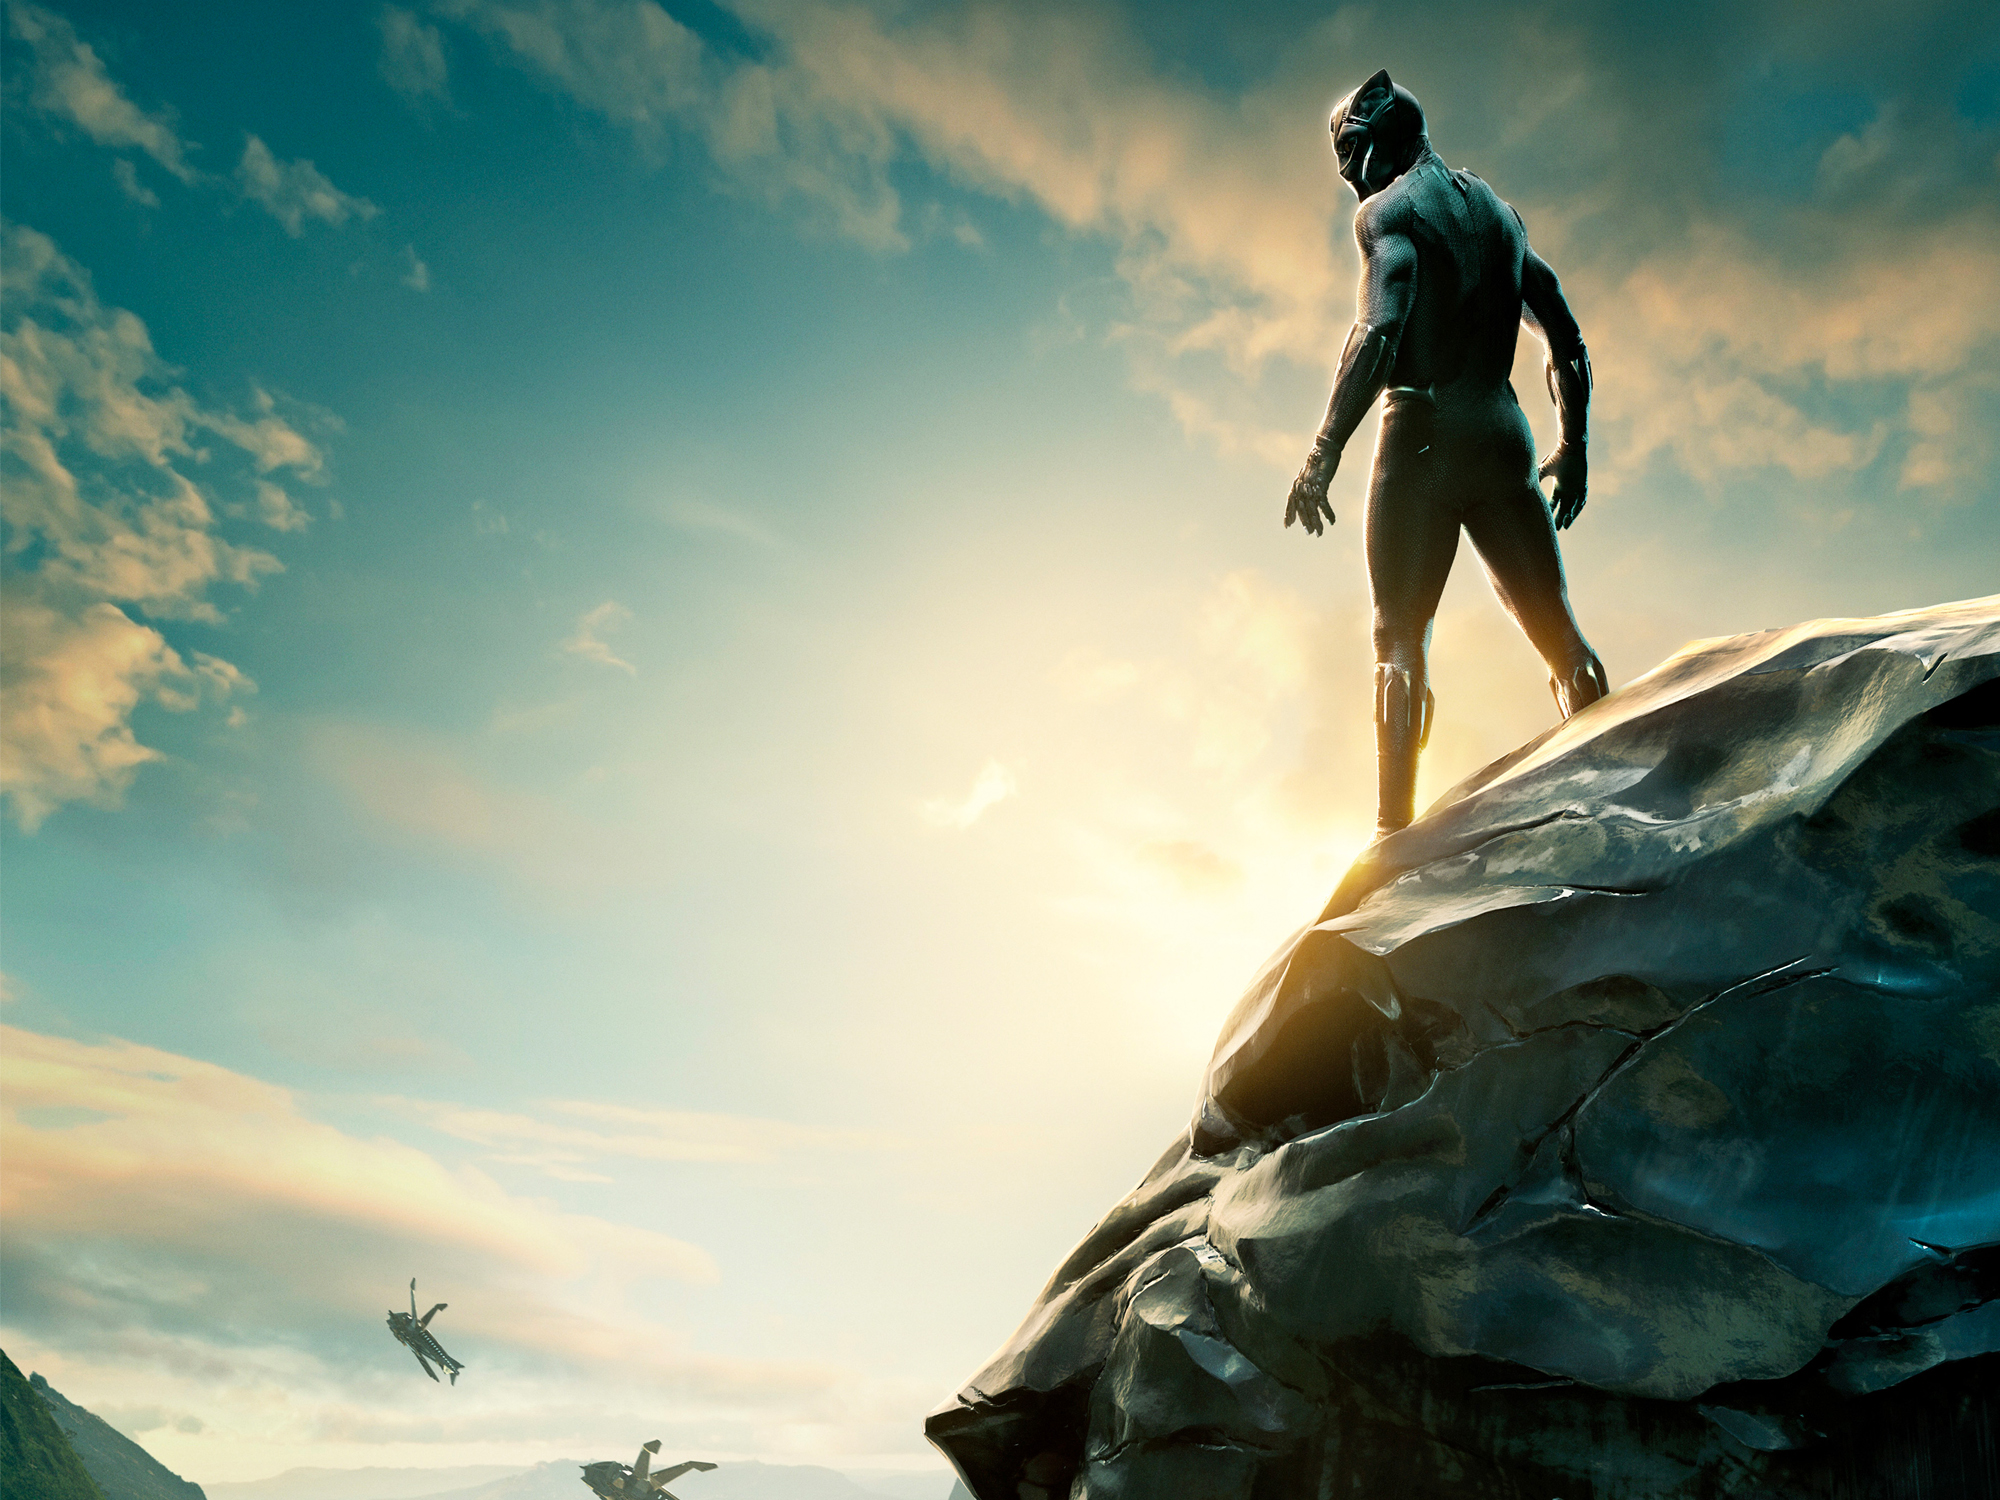 Black-Panther-film-review.jpg